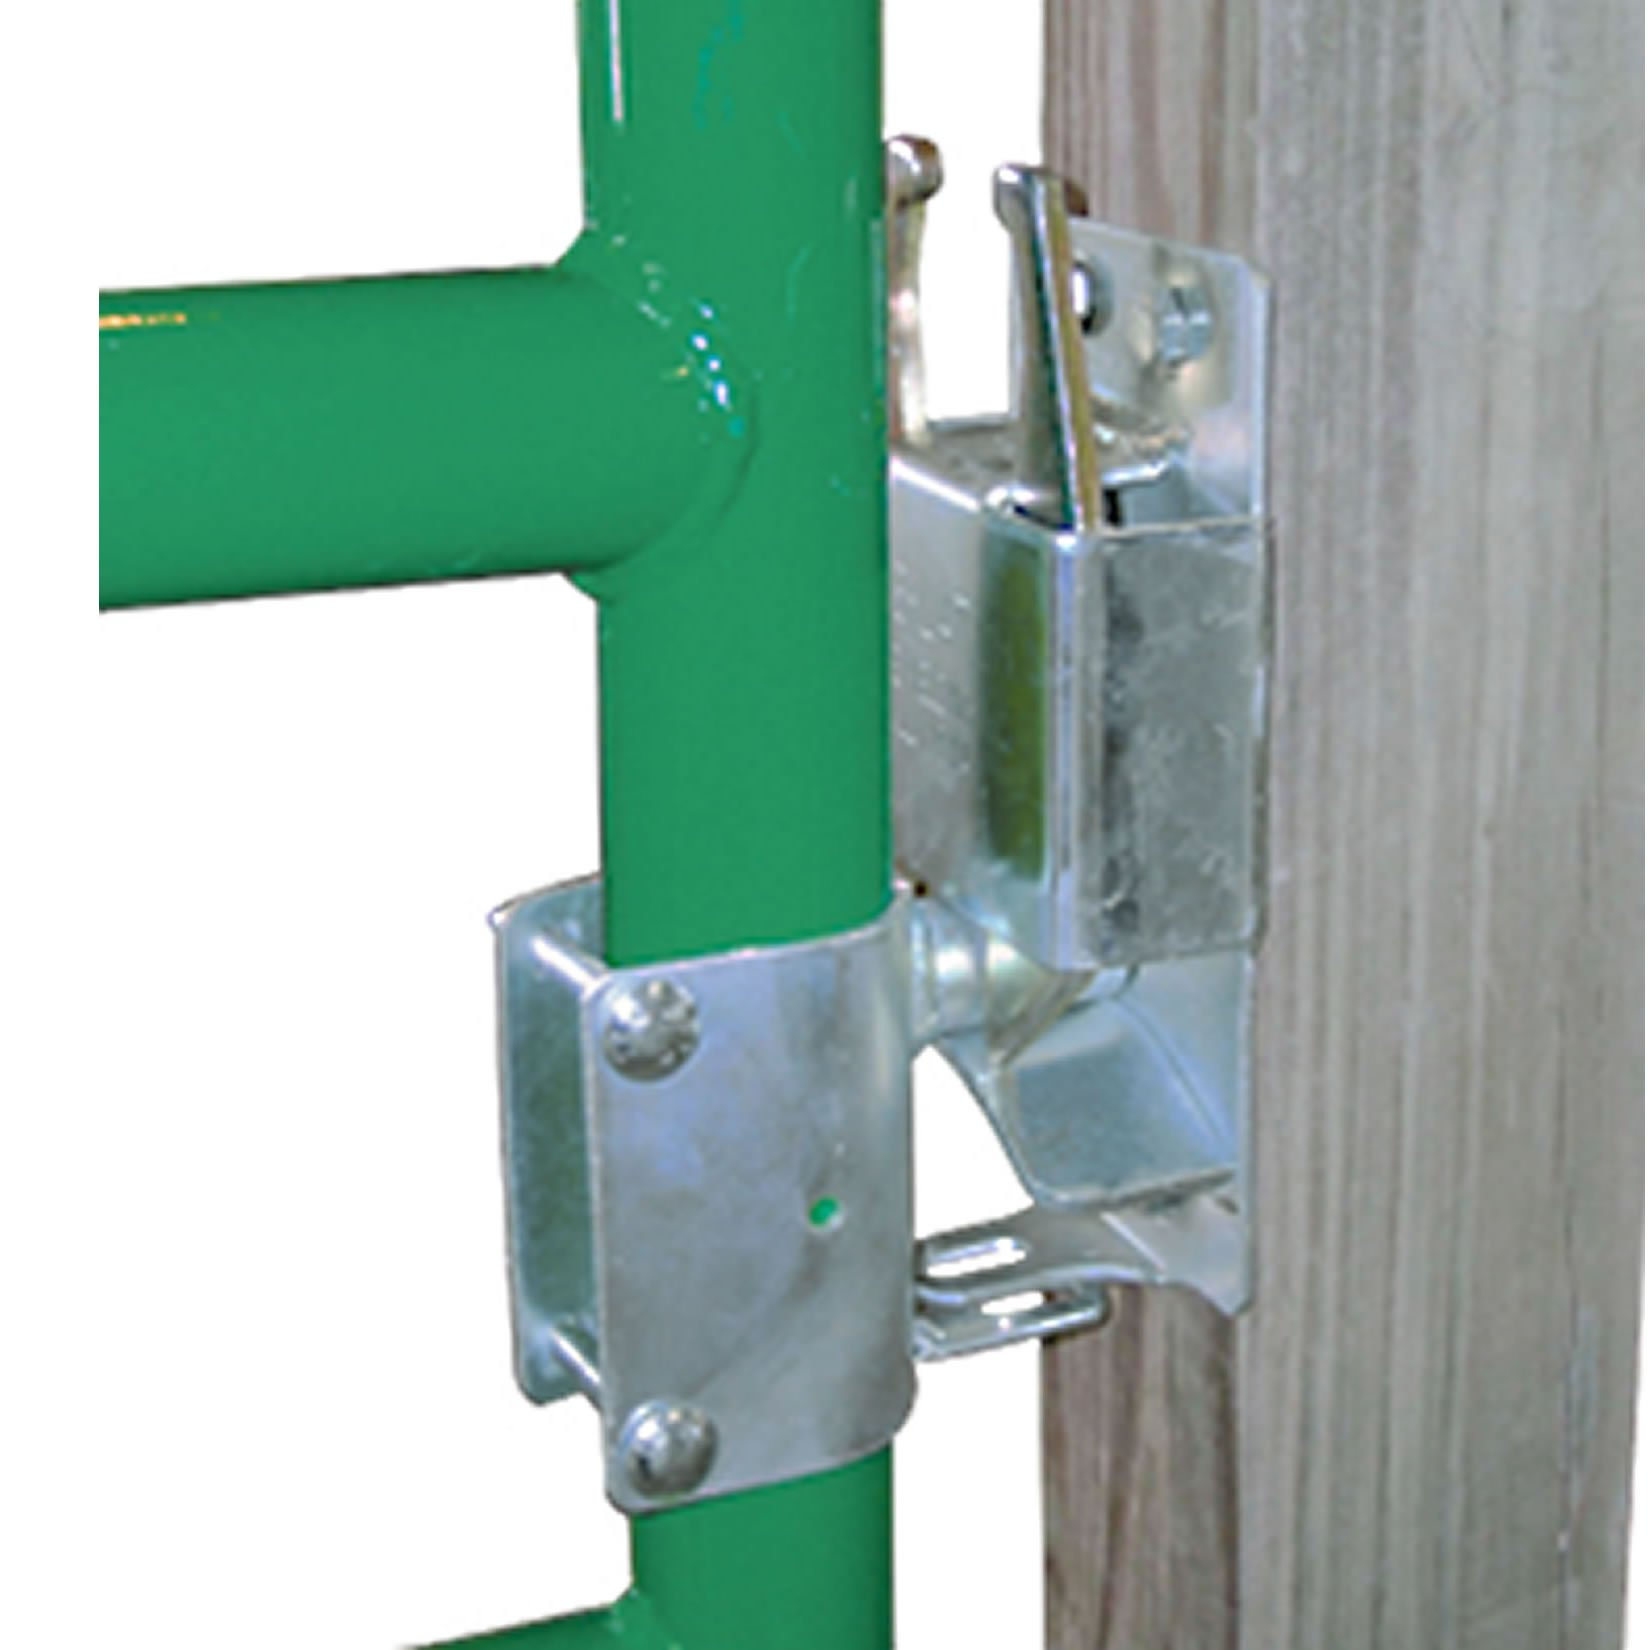 Co-Line Lockable 2-Way Livestock Gate Latch